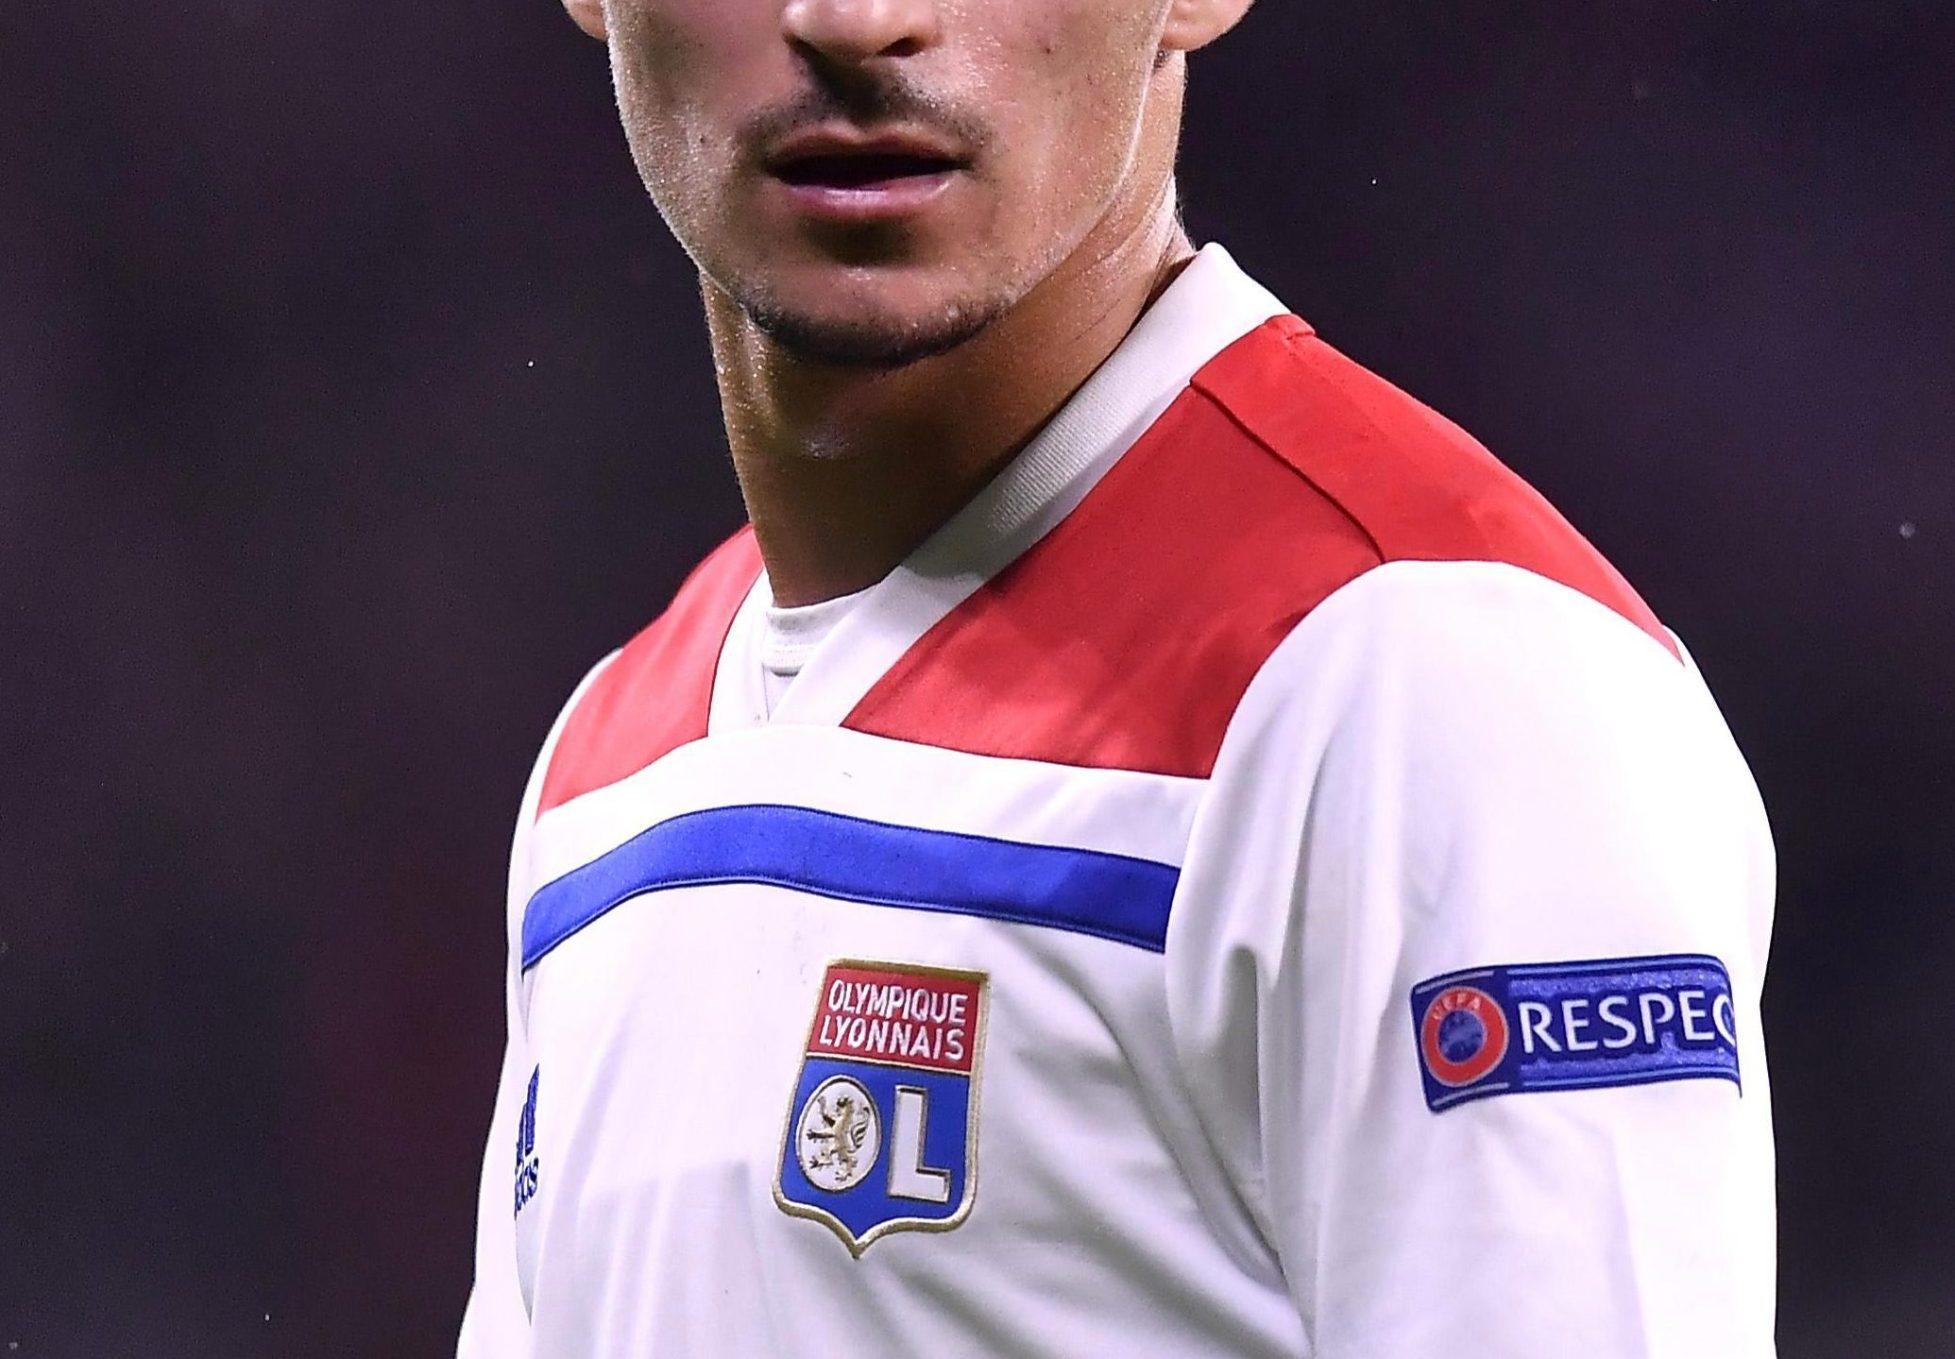 Lyon midfielder Houssem Aouar is a major target for Maurizio Sarri at Chelsea